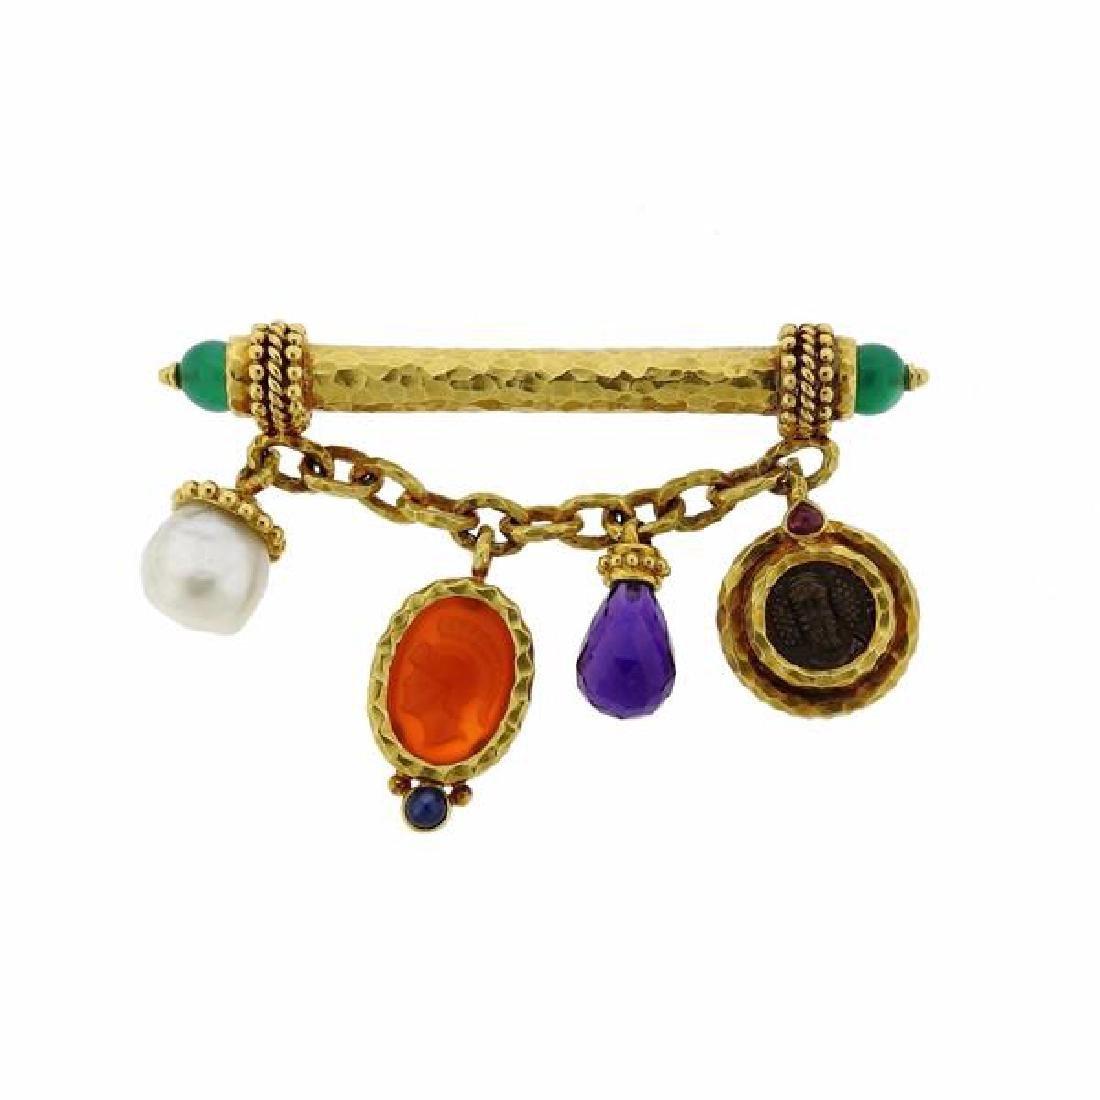 18k Gold Coin Pearl Gemstone Charm Brooch Pin